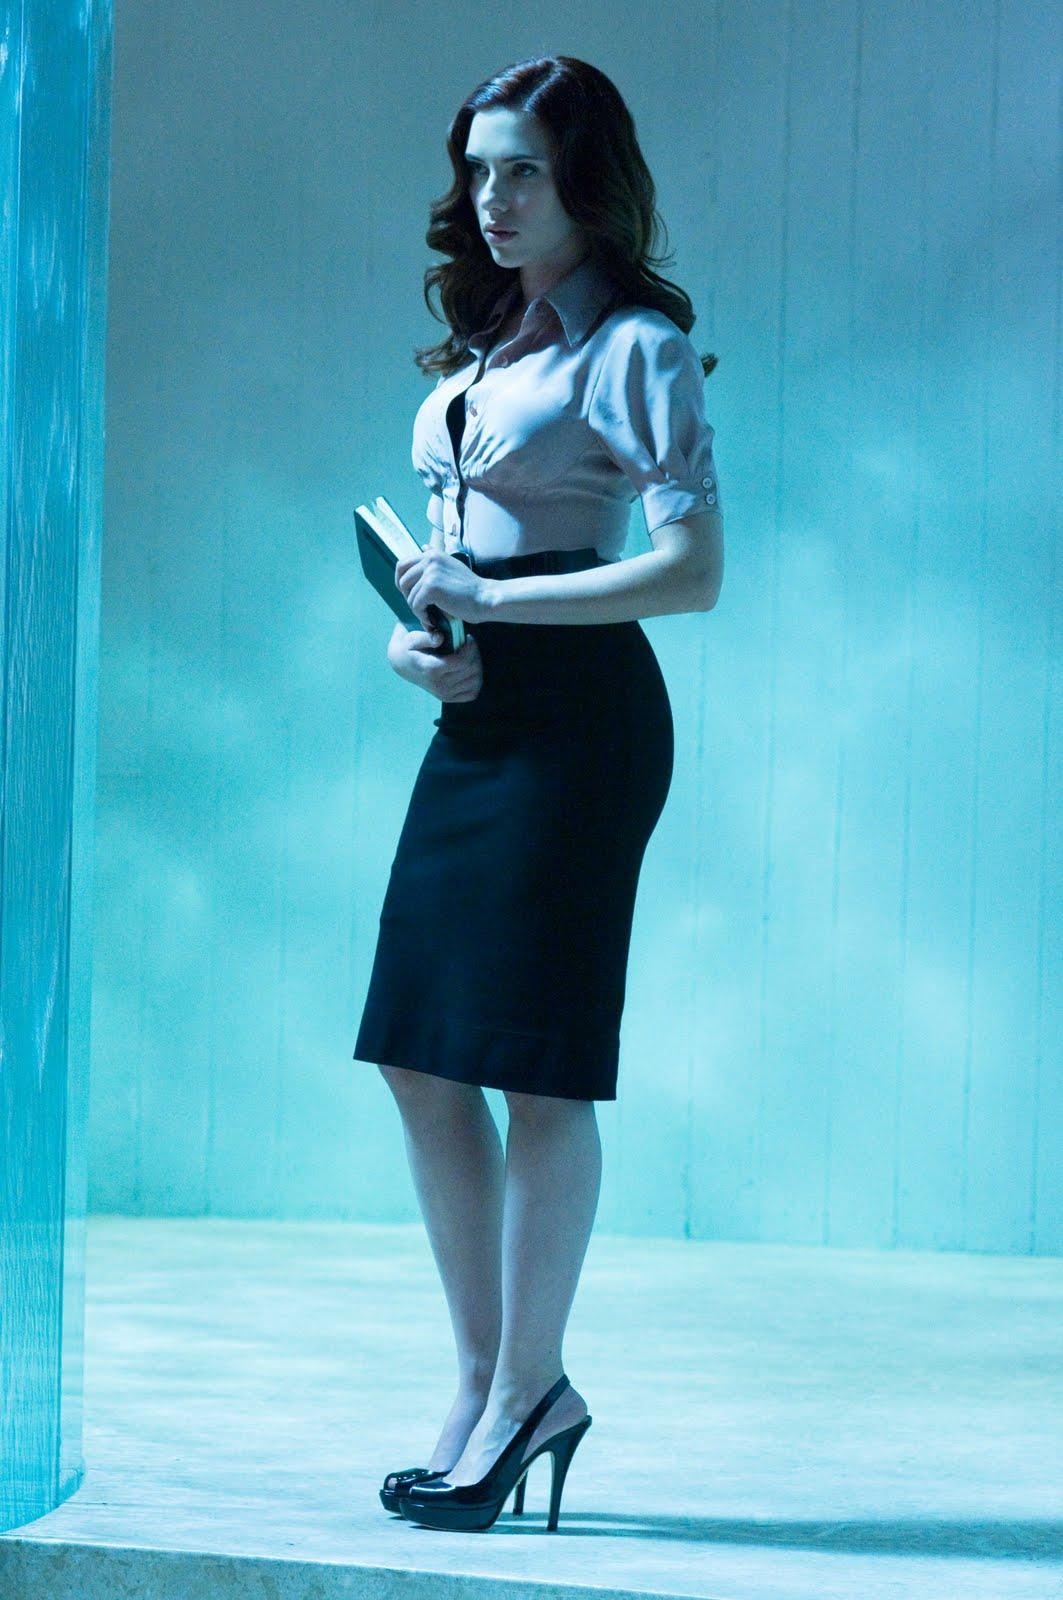 Scarlett Johansson Black Widow Wallpapers background